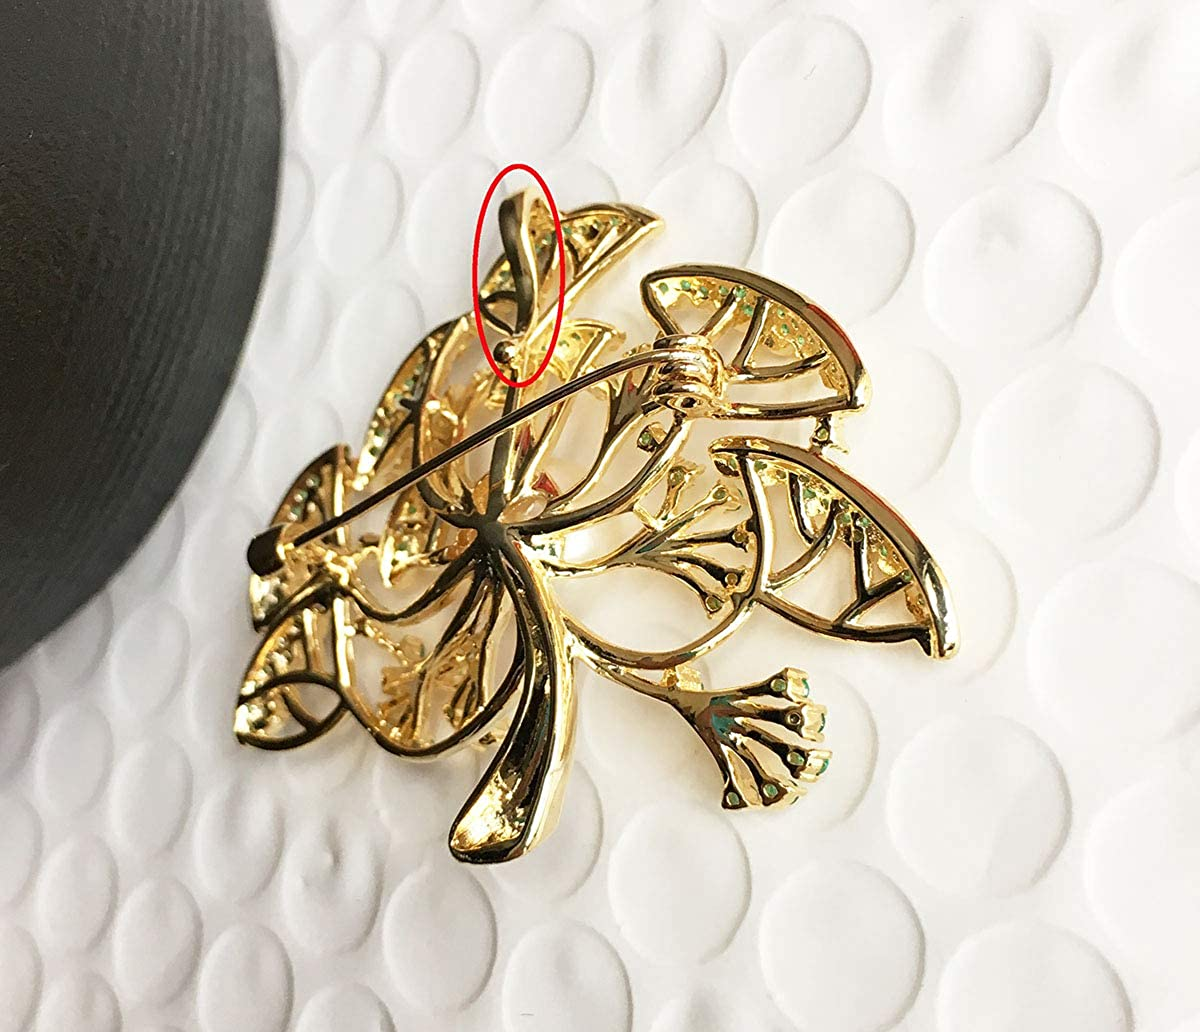 Xinruiyuan Golden Pine-Tree Brooch Pendant Women Wedding Party Dress Pearl